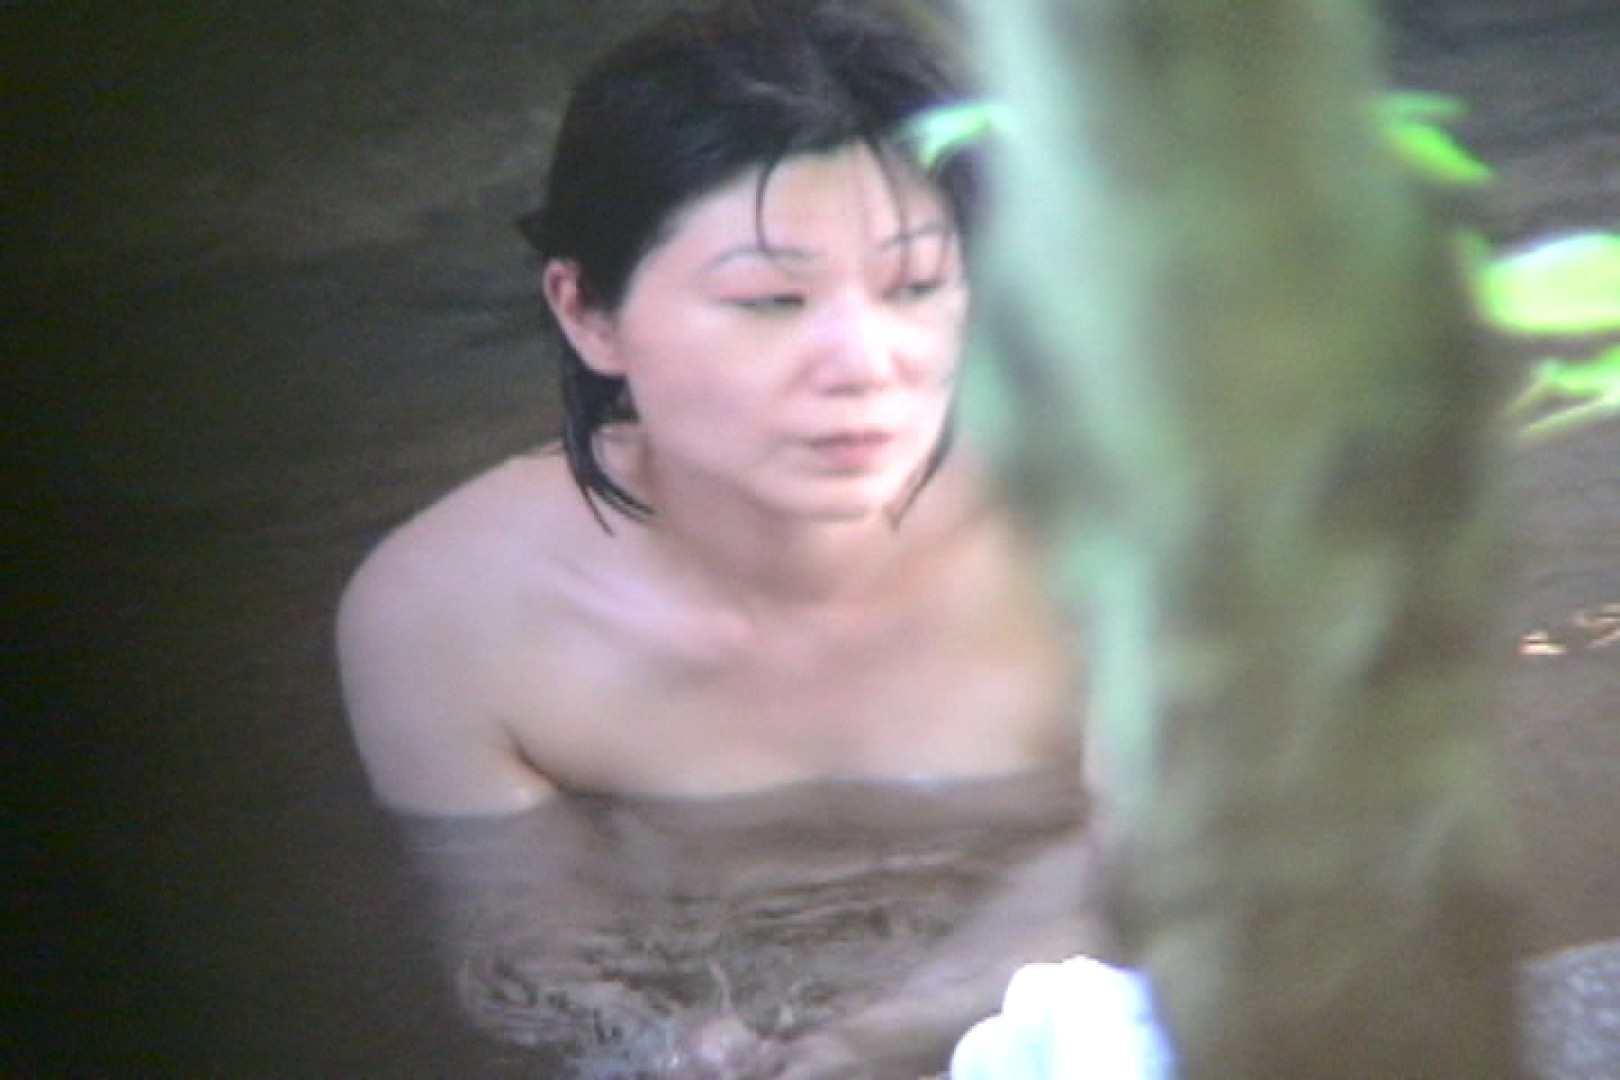 Aquaな露天風呂Vol.449 盗撮 | HなOL  101pic 54